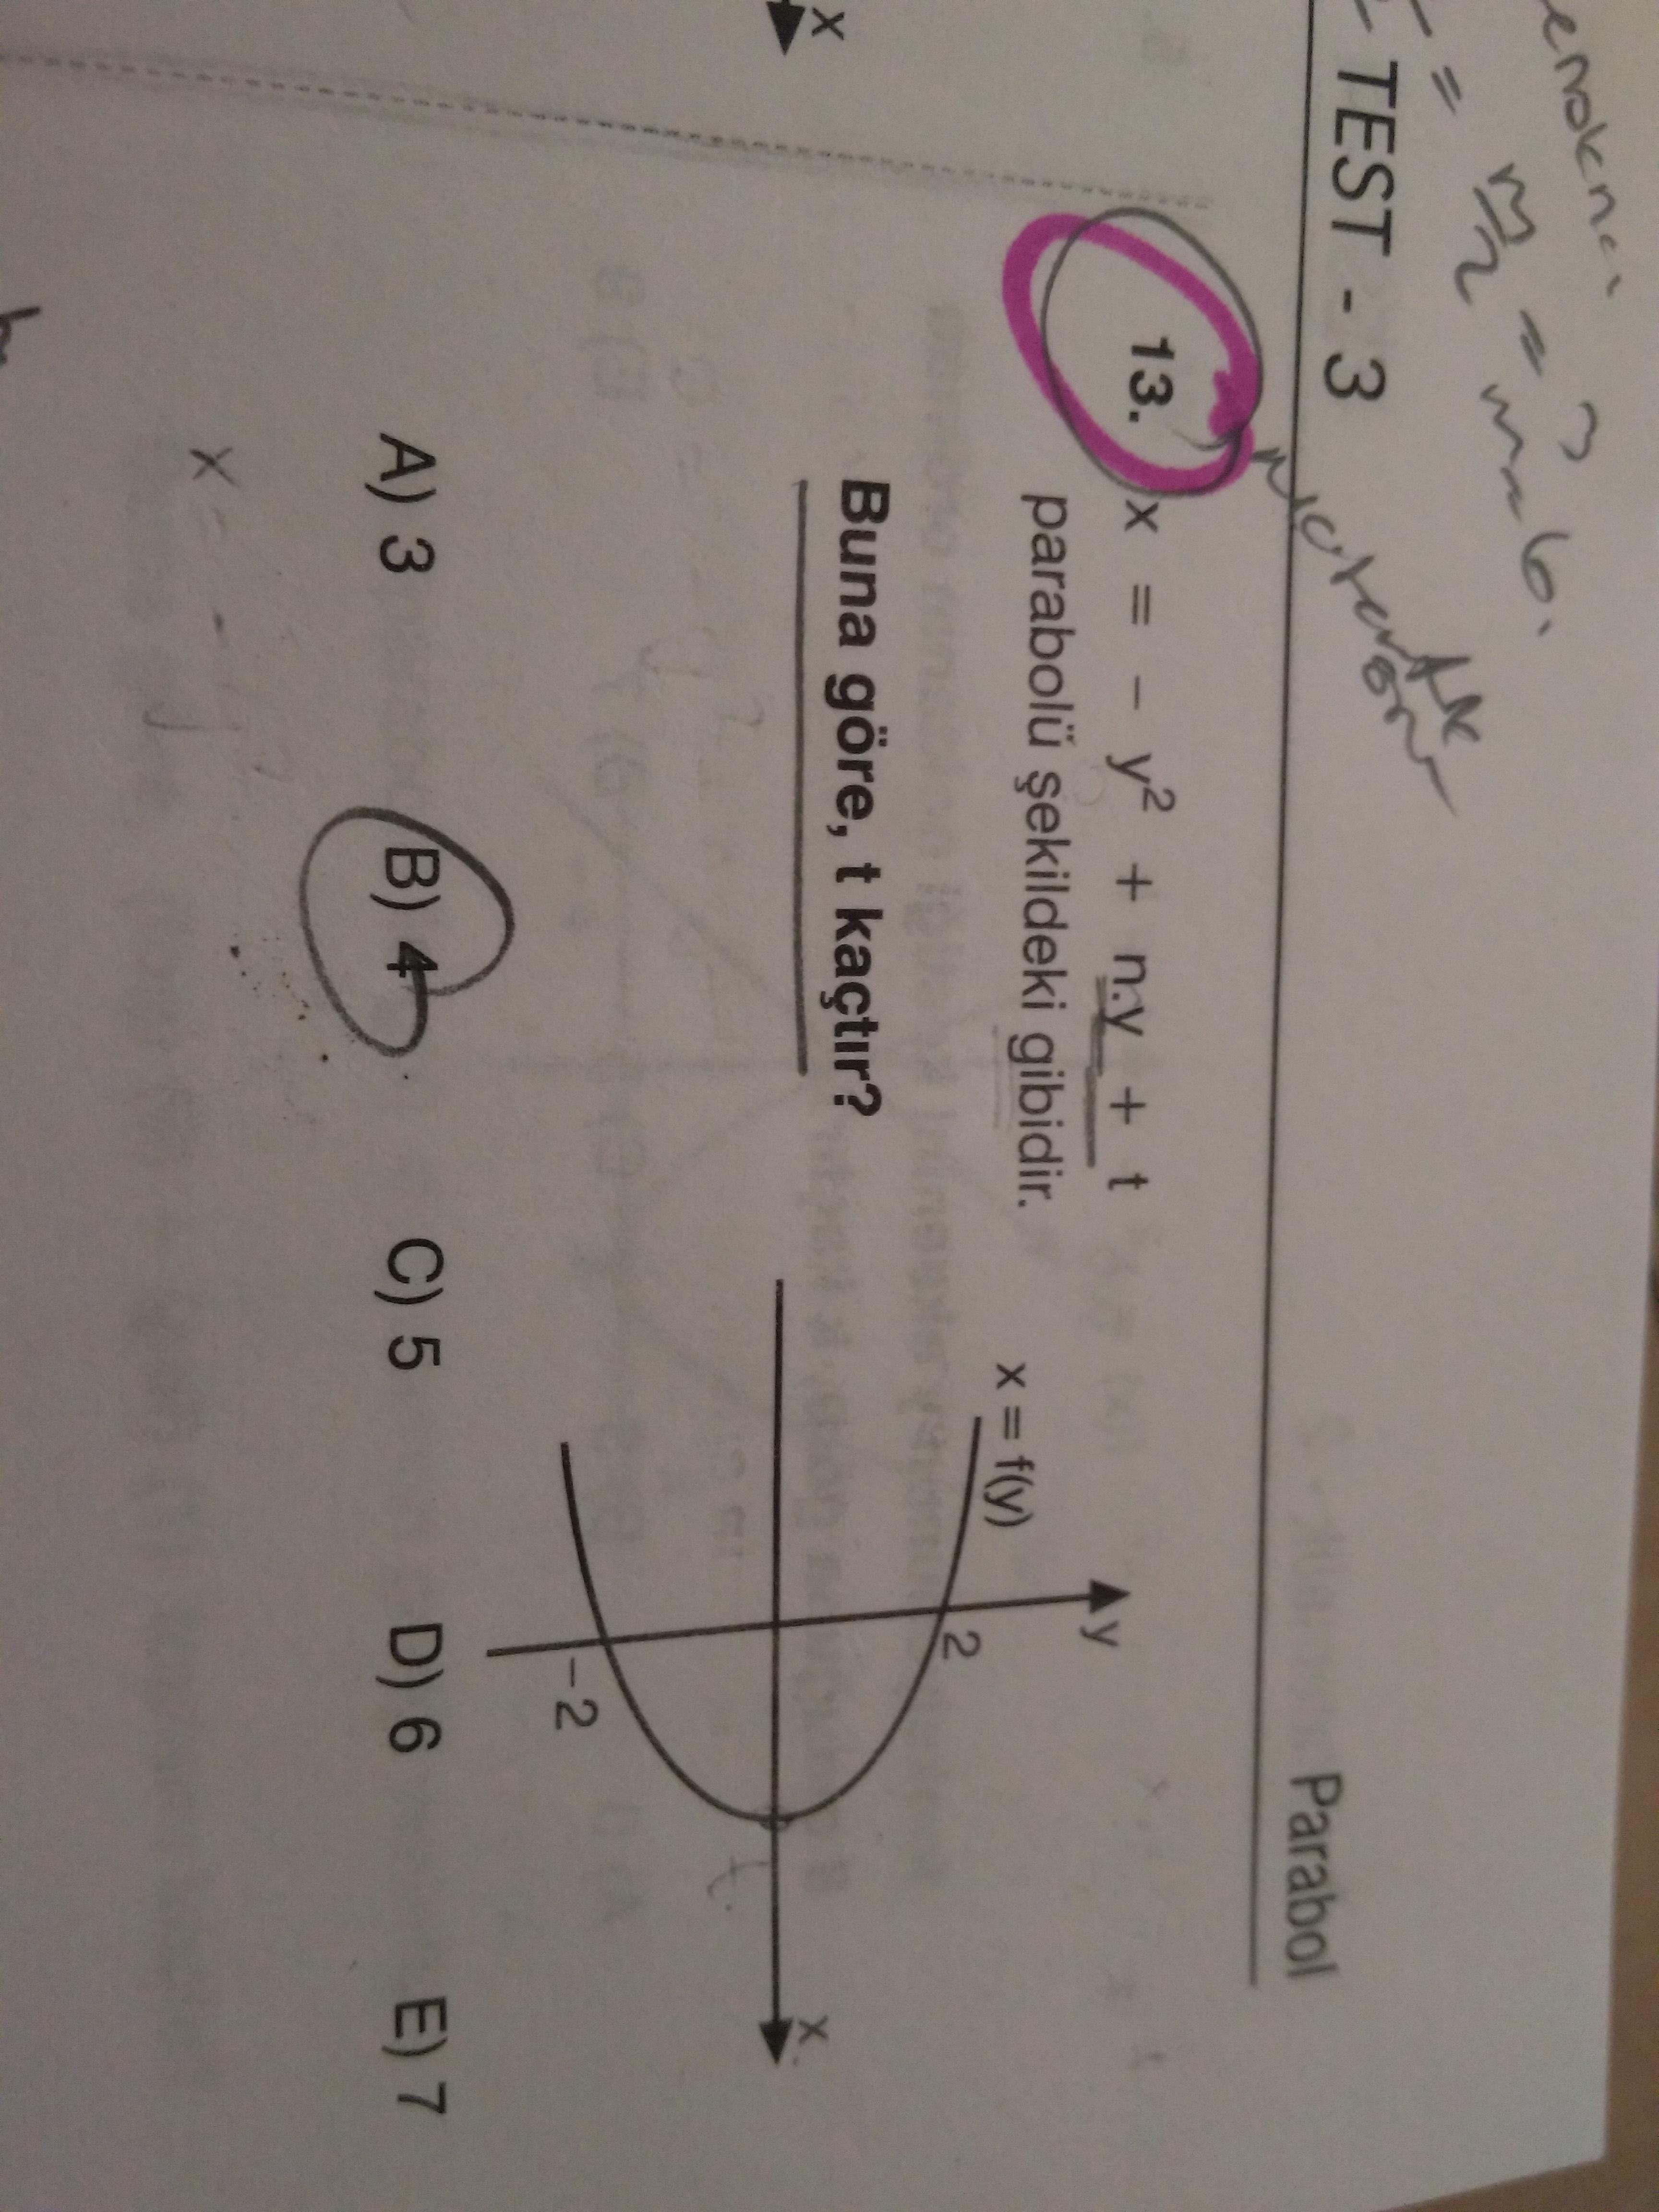 Parabol (t kactir)